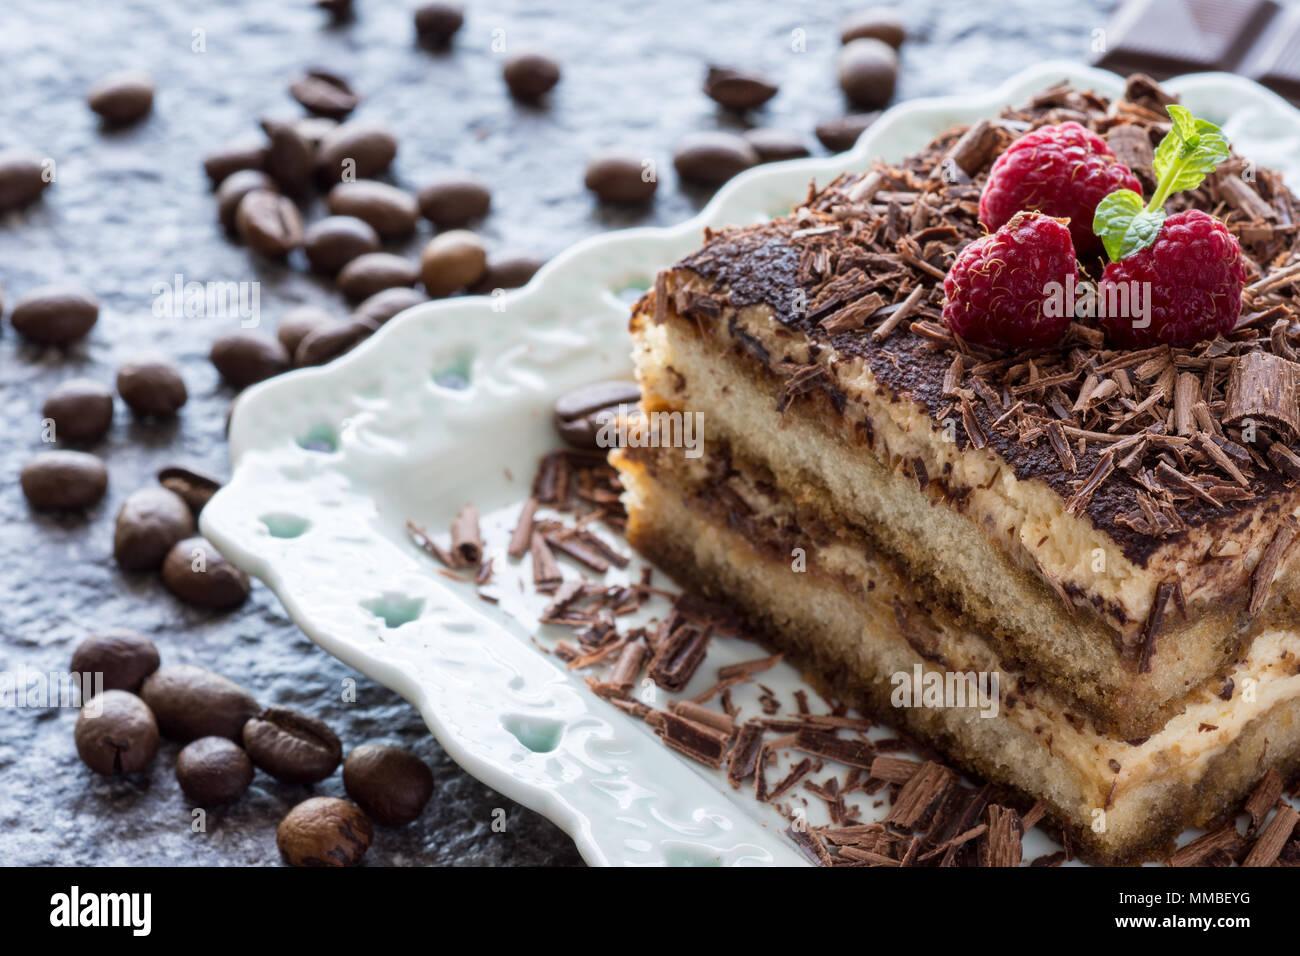 Dessert Tiramisu Cake with Grated Chocolate, Raspberry and Mint - Stock Image